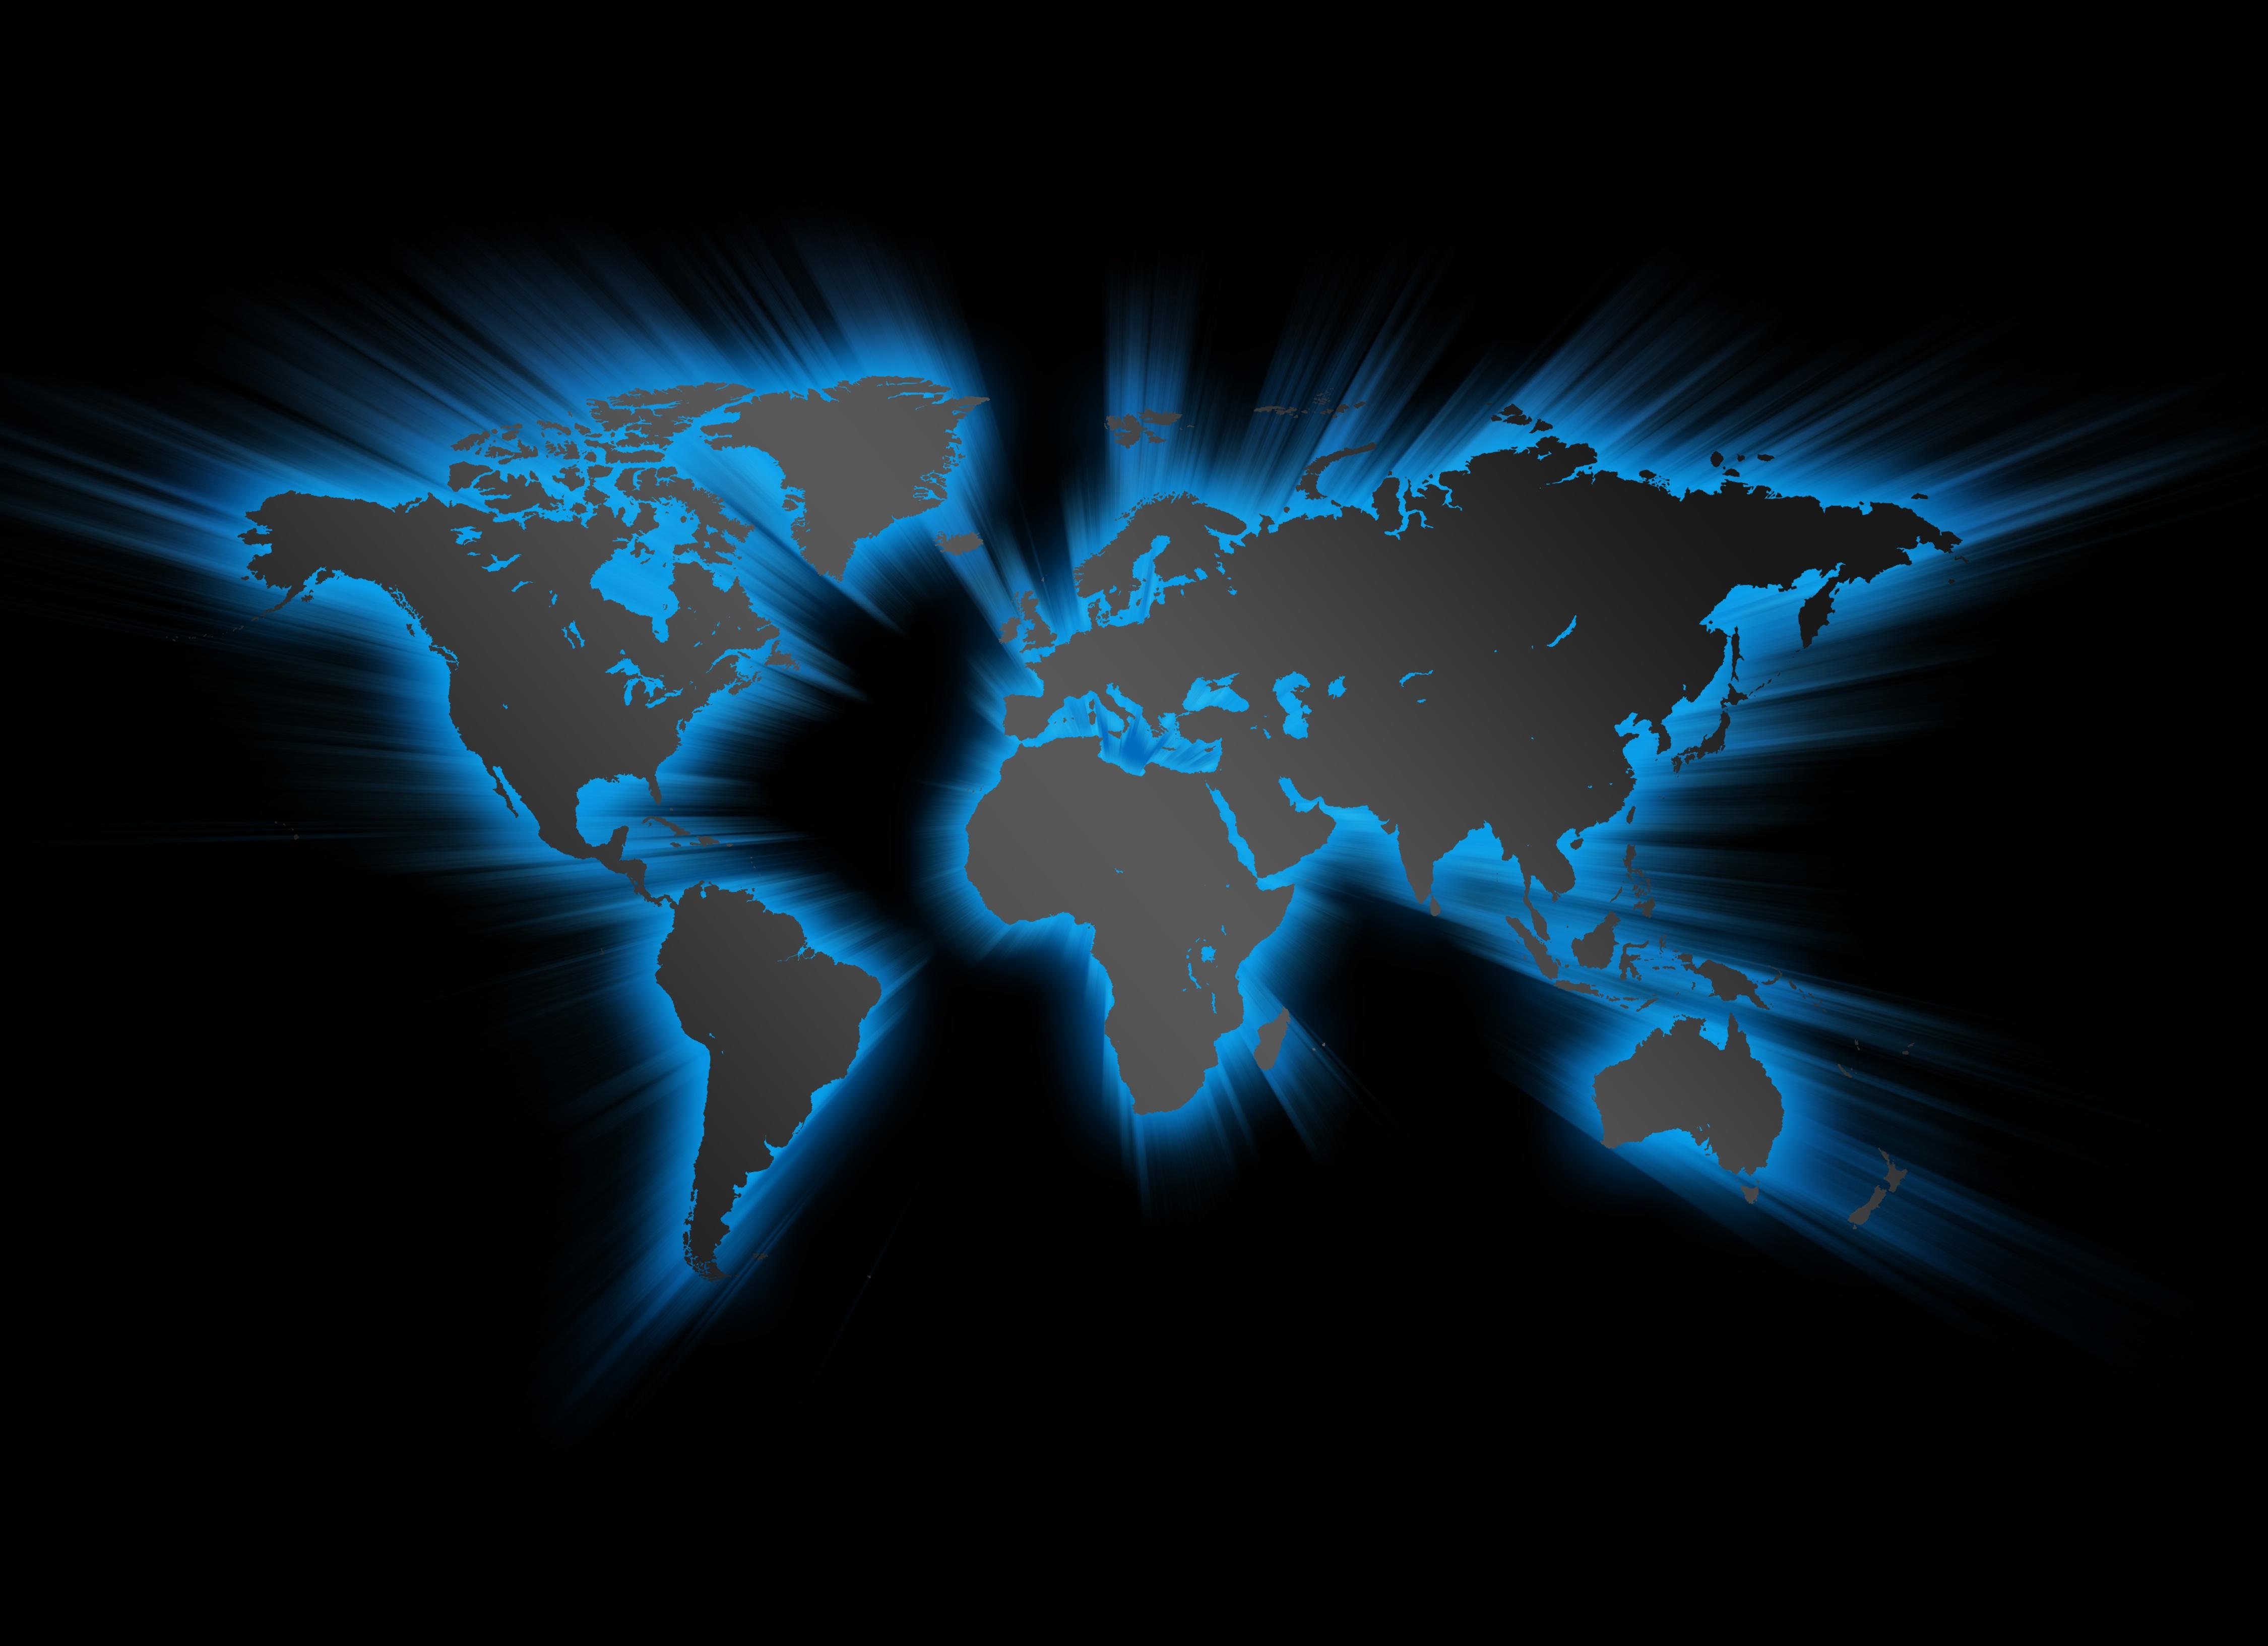 WORLD  WORLD  WORLD  WORLD  WORLD  WORLD  WORLD  WORLD